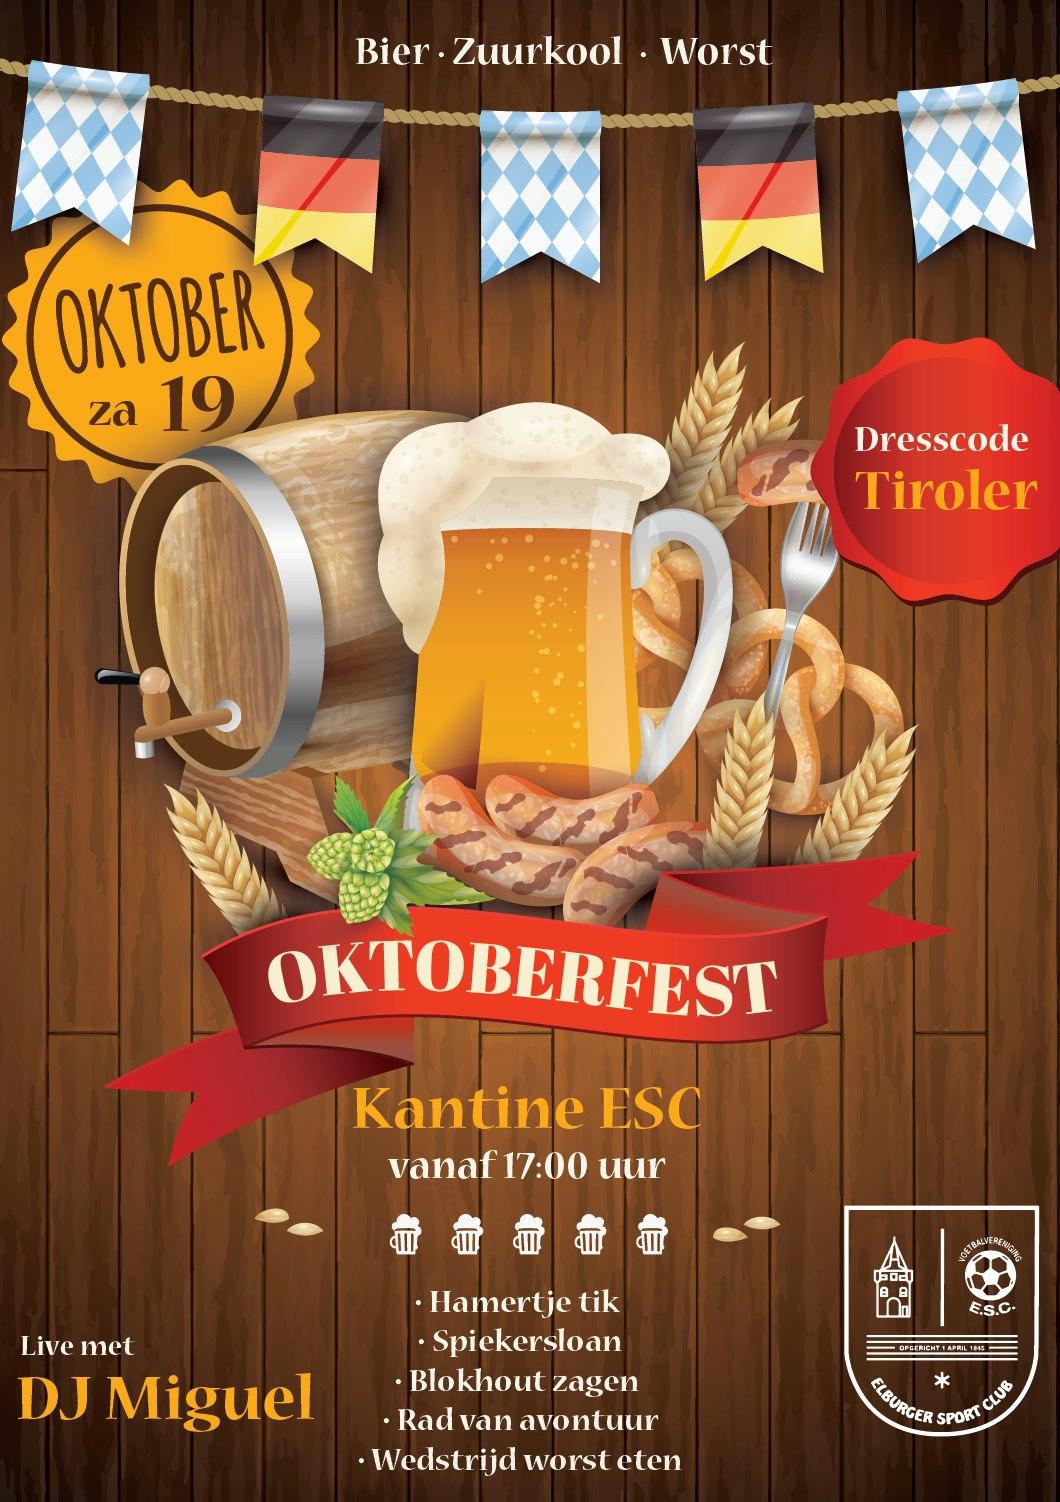 As. zaterdag oktoberfest kantine ESC - Elburger SC